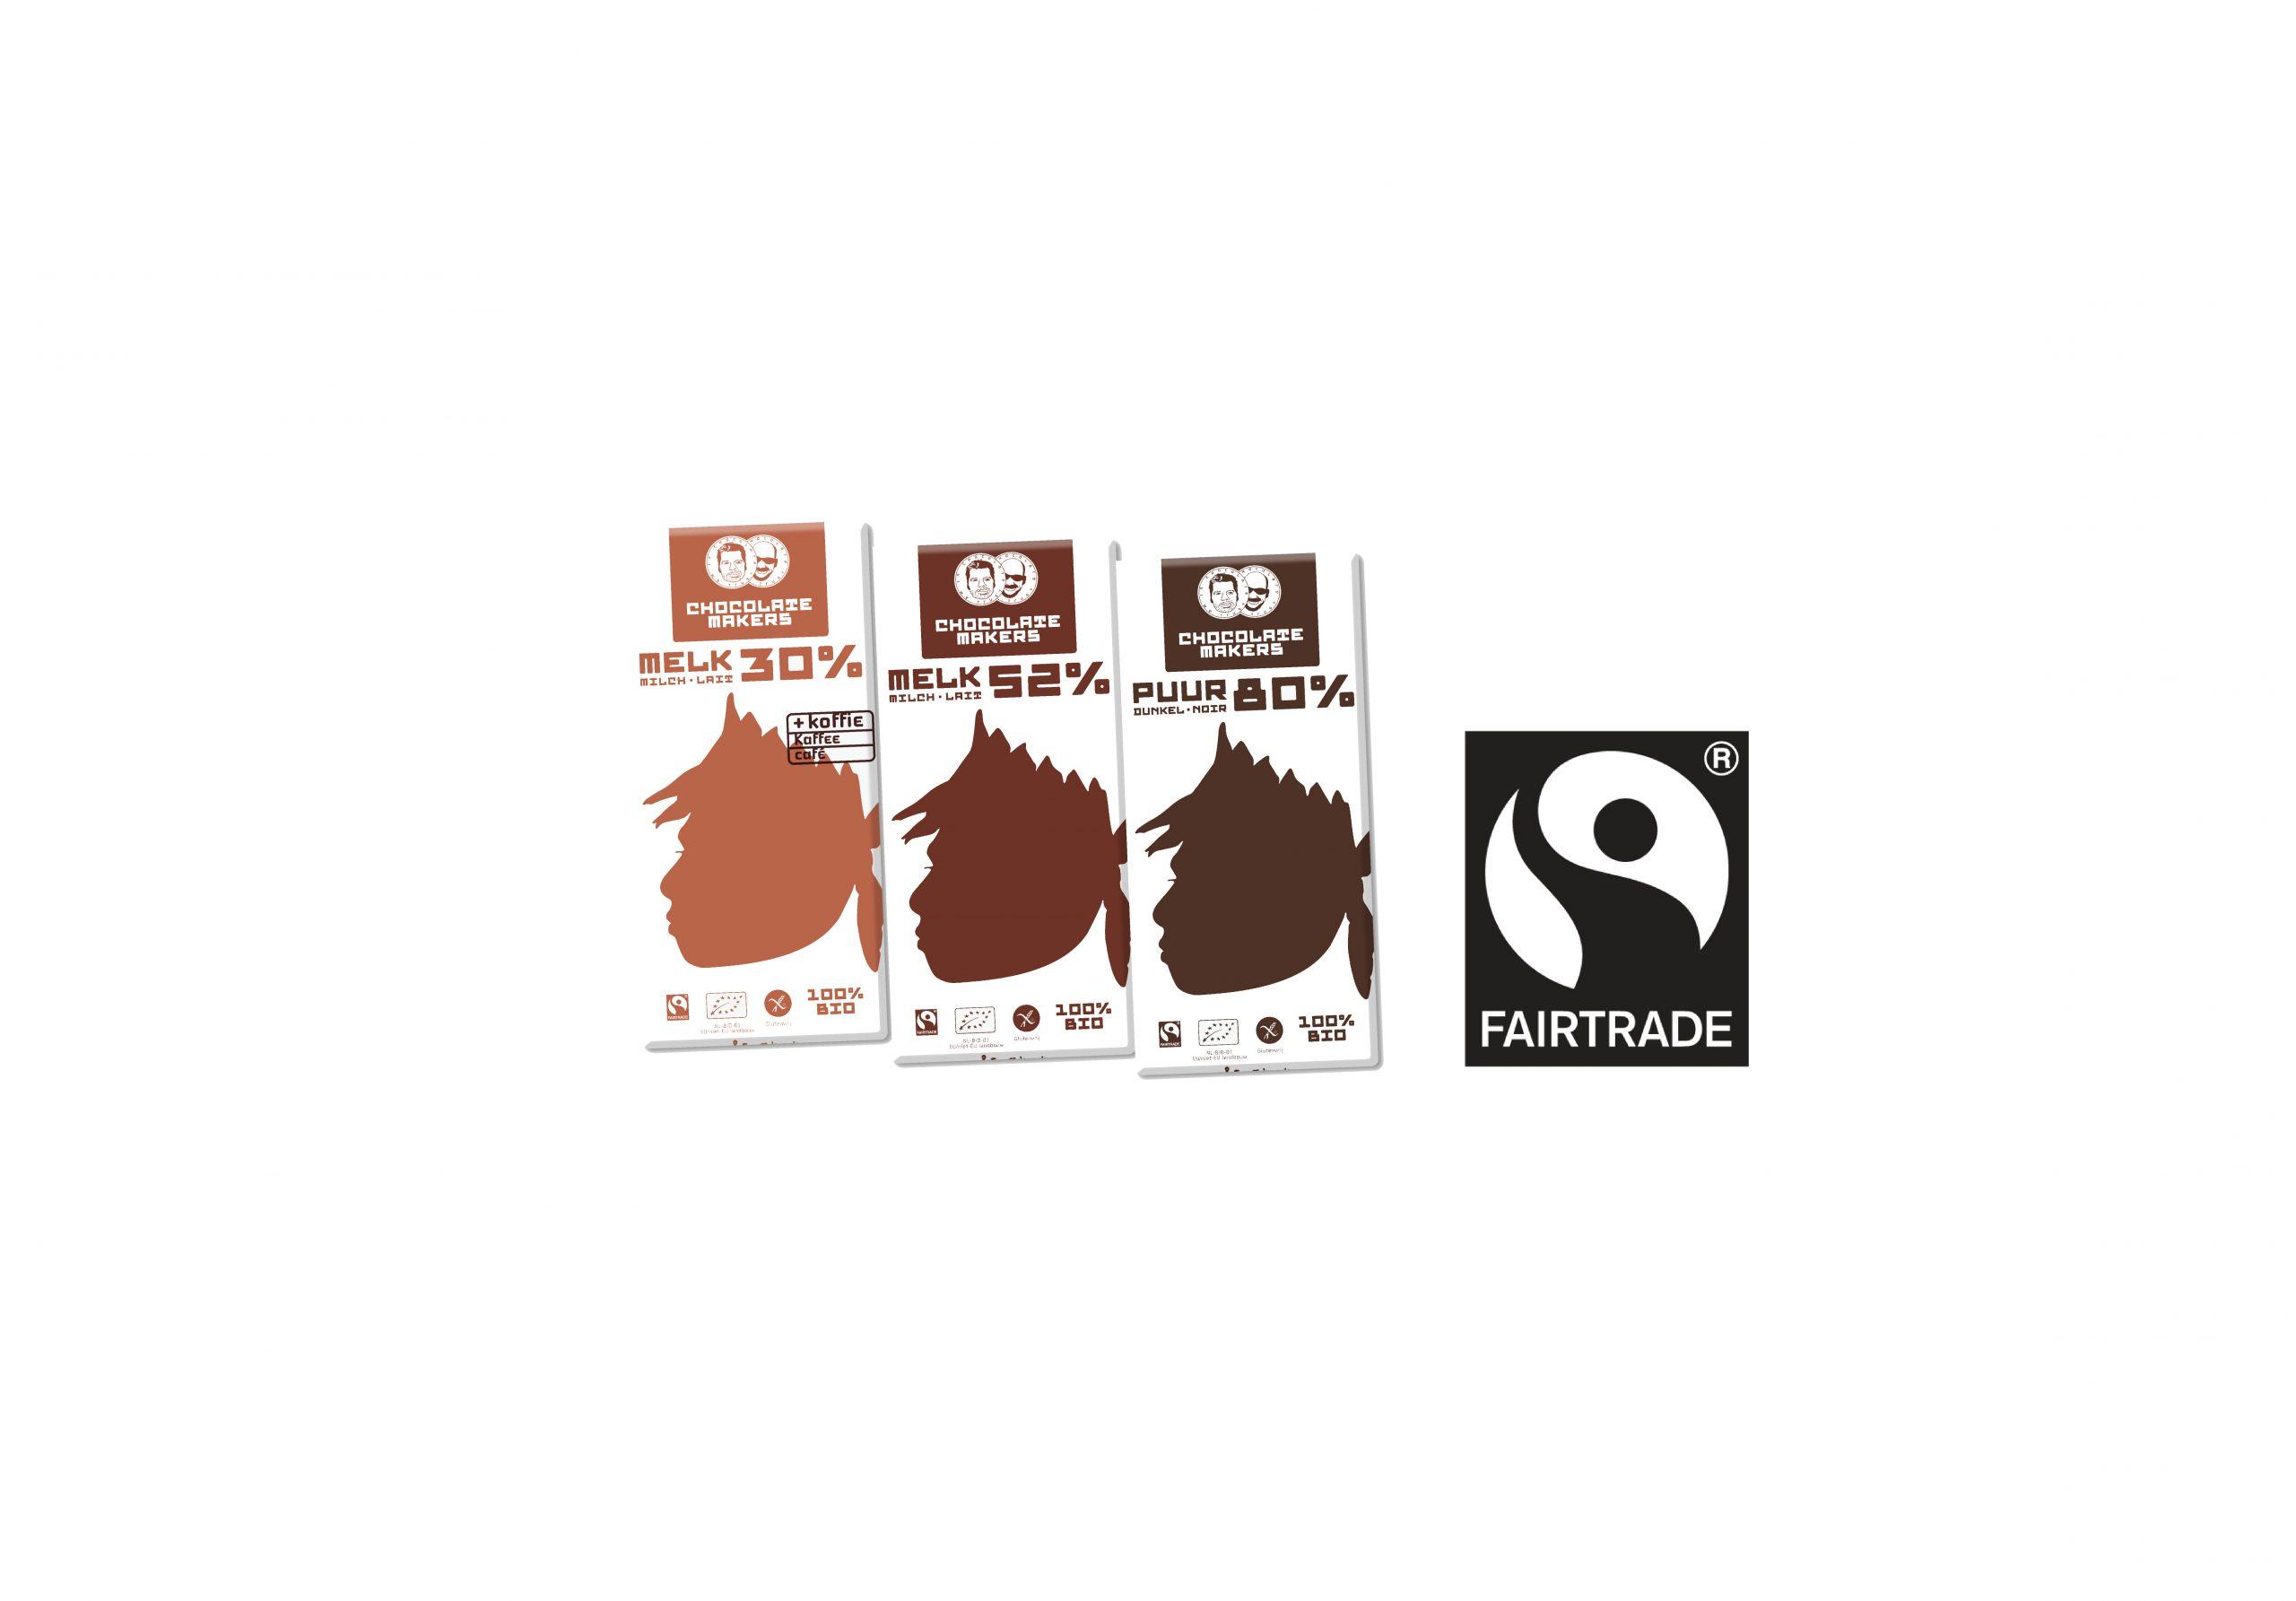 Chocolatemakers Fairtrade